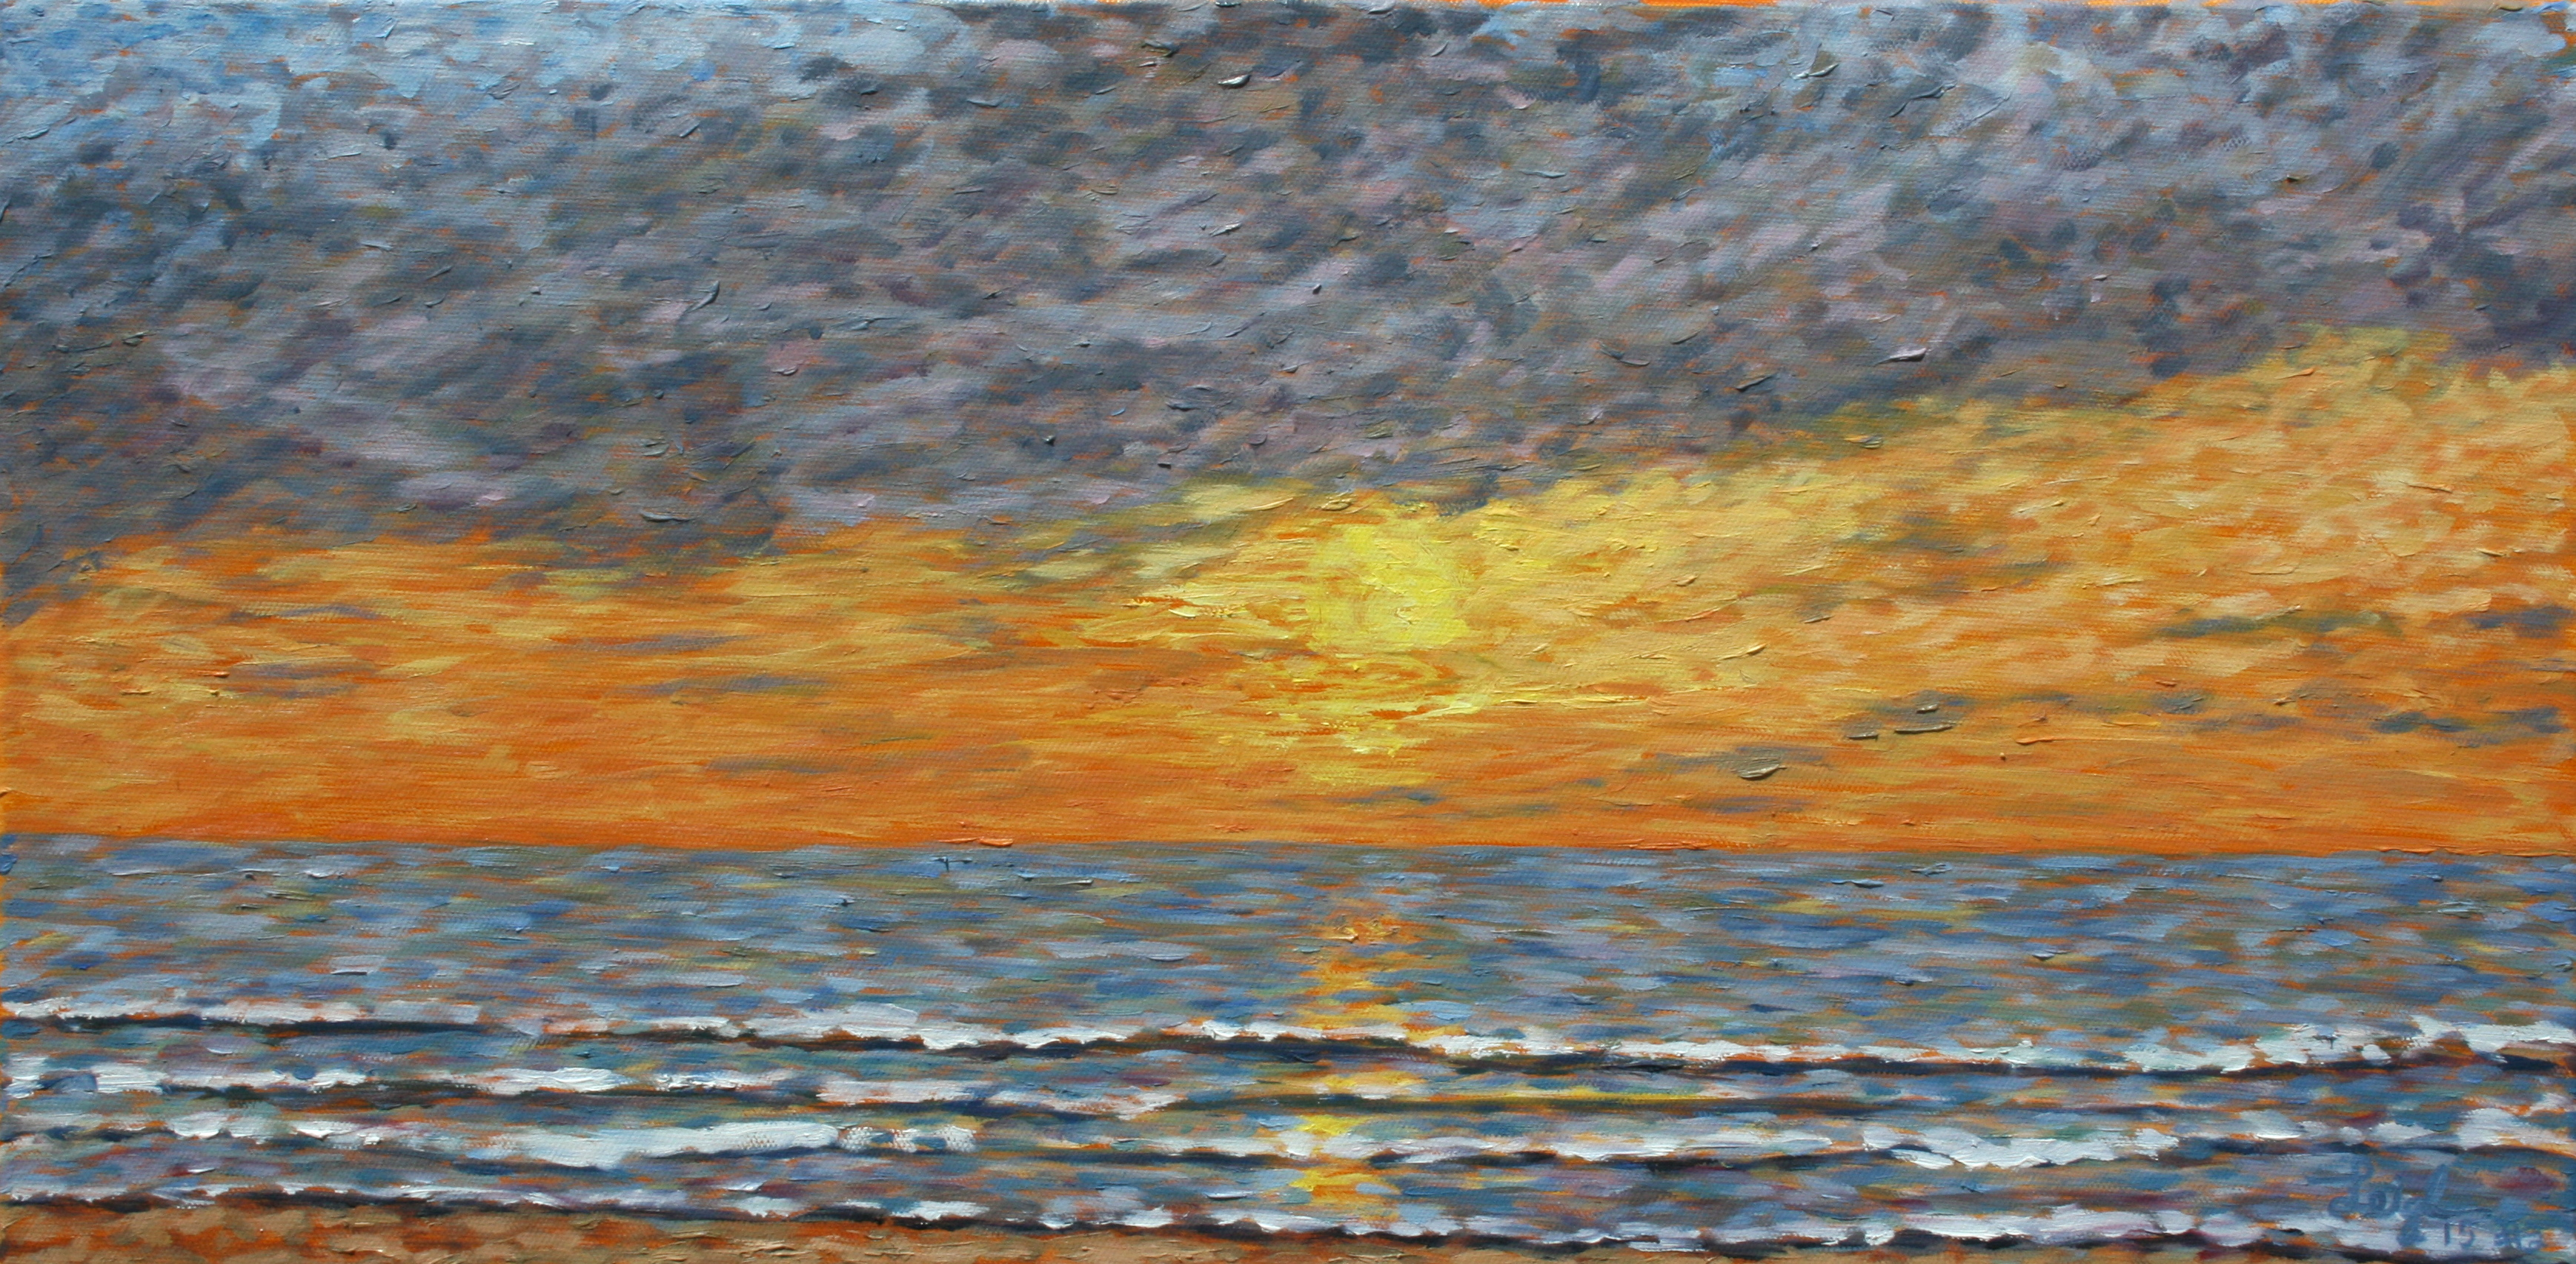 Sunset 2015 #2  ~   Leslie Anderson La Jolla, CA 2015 • 12 x 24